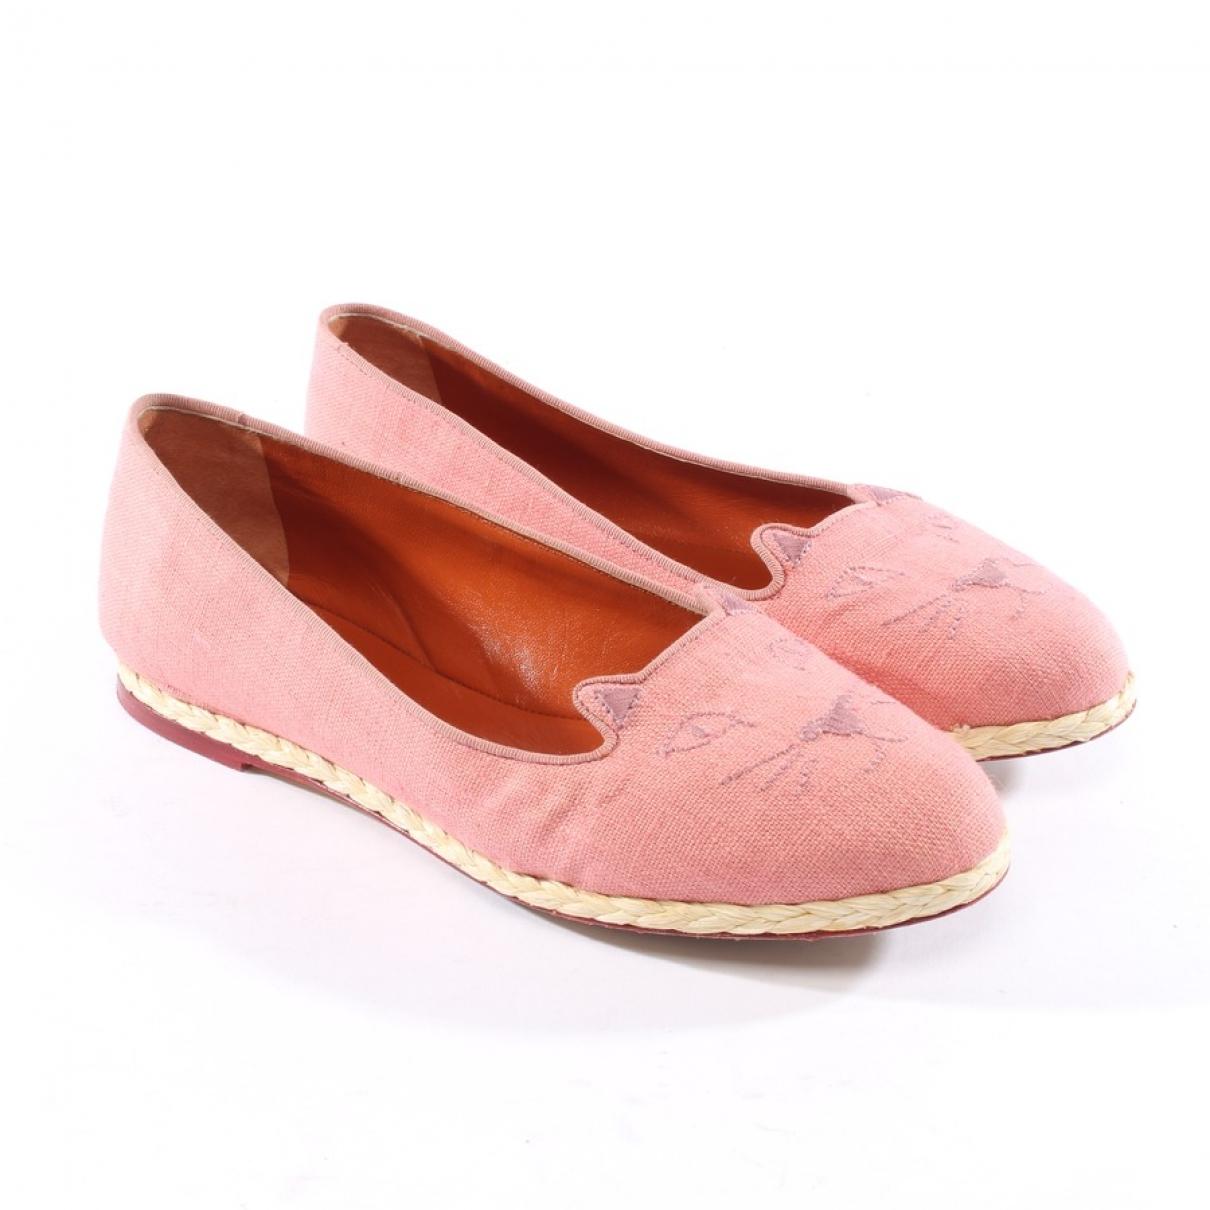 Charlotte Olympia - Ballerines   pour femme en toile - rose